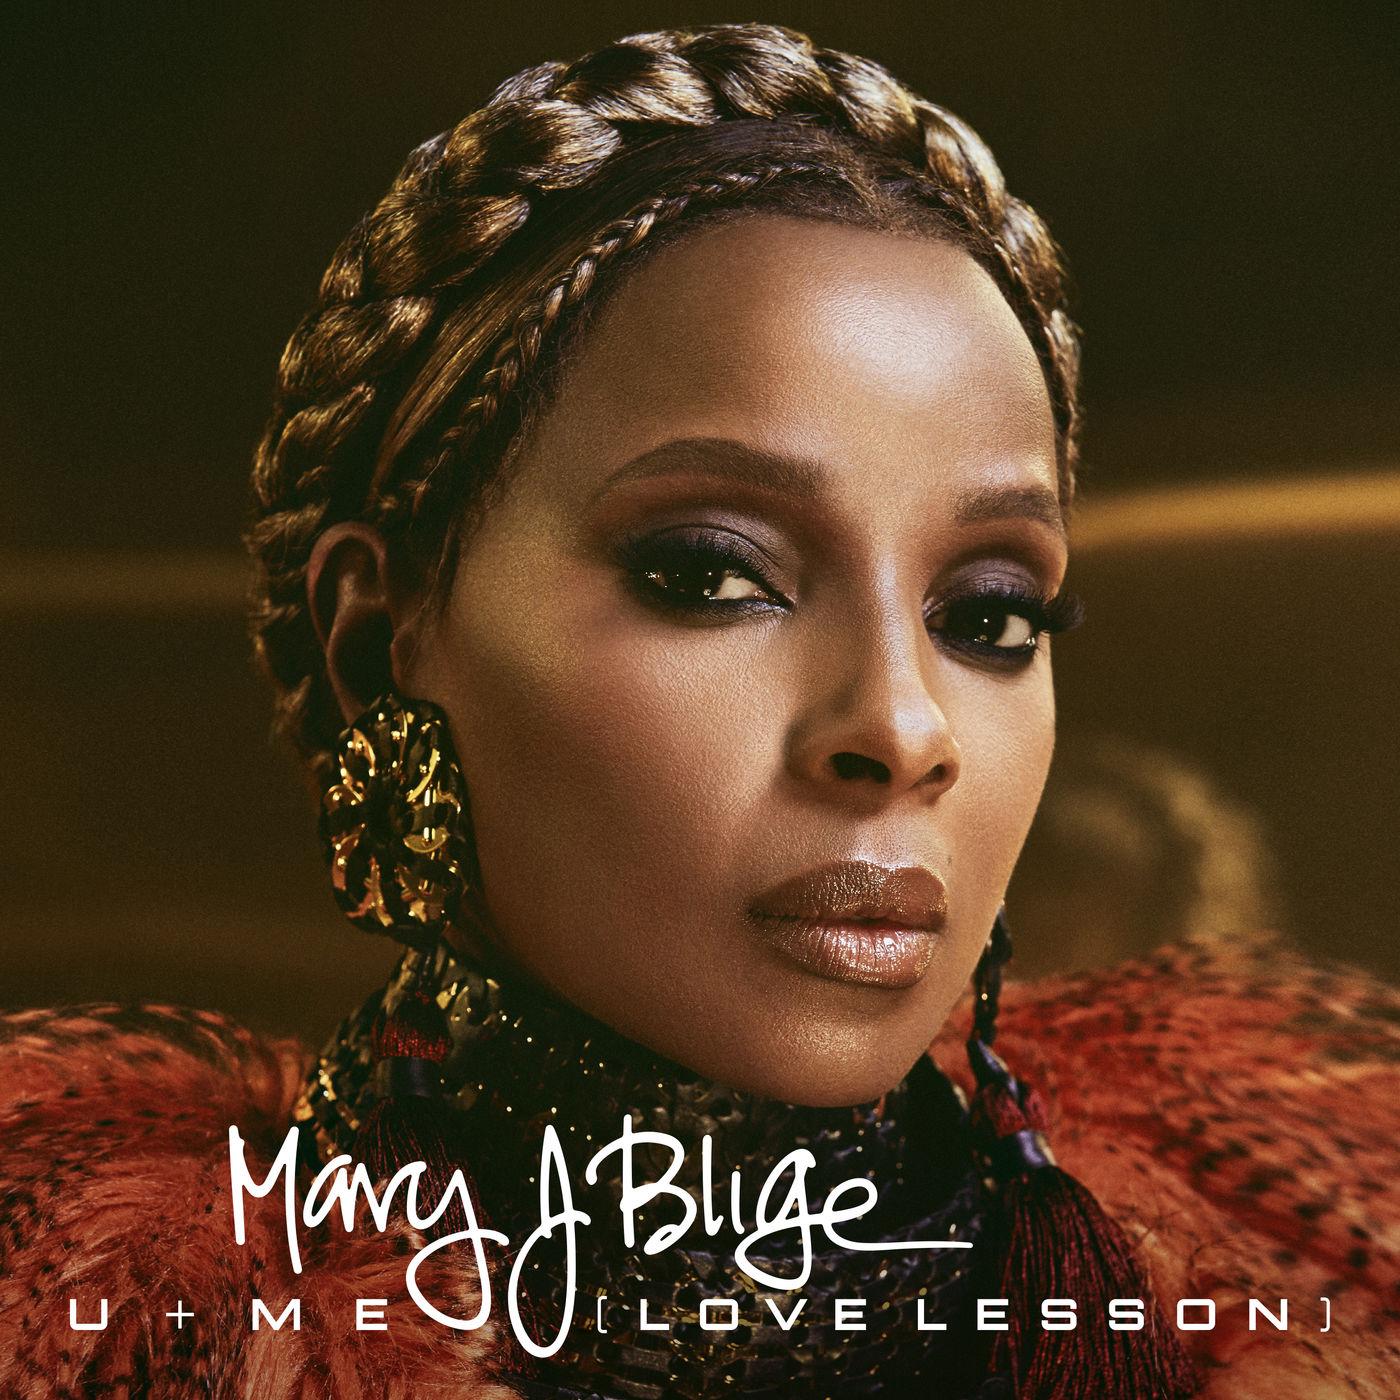 Mary J. Blige - U + Me (Love Lesson) - Single Cover